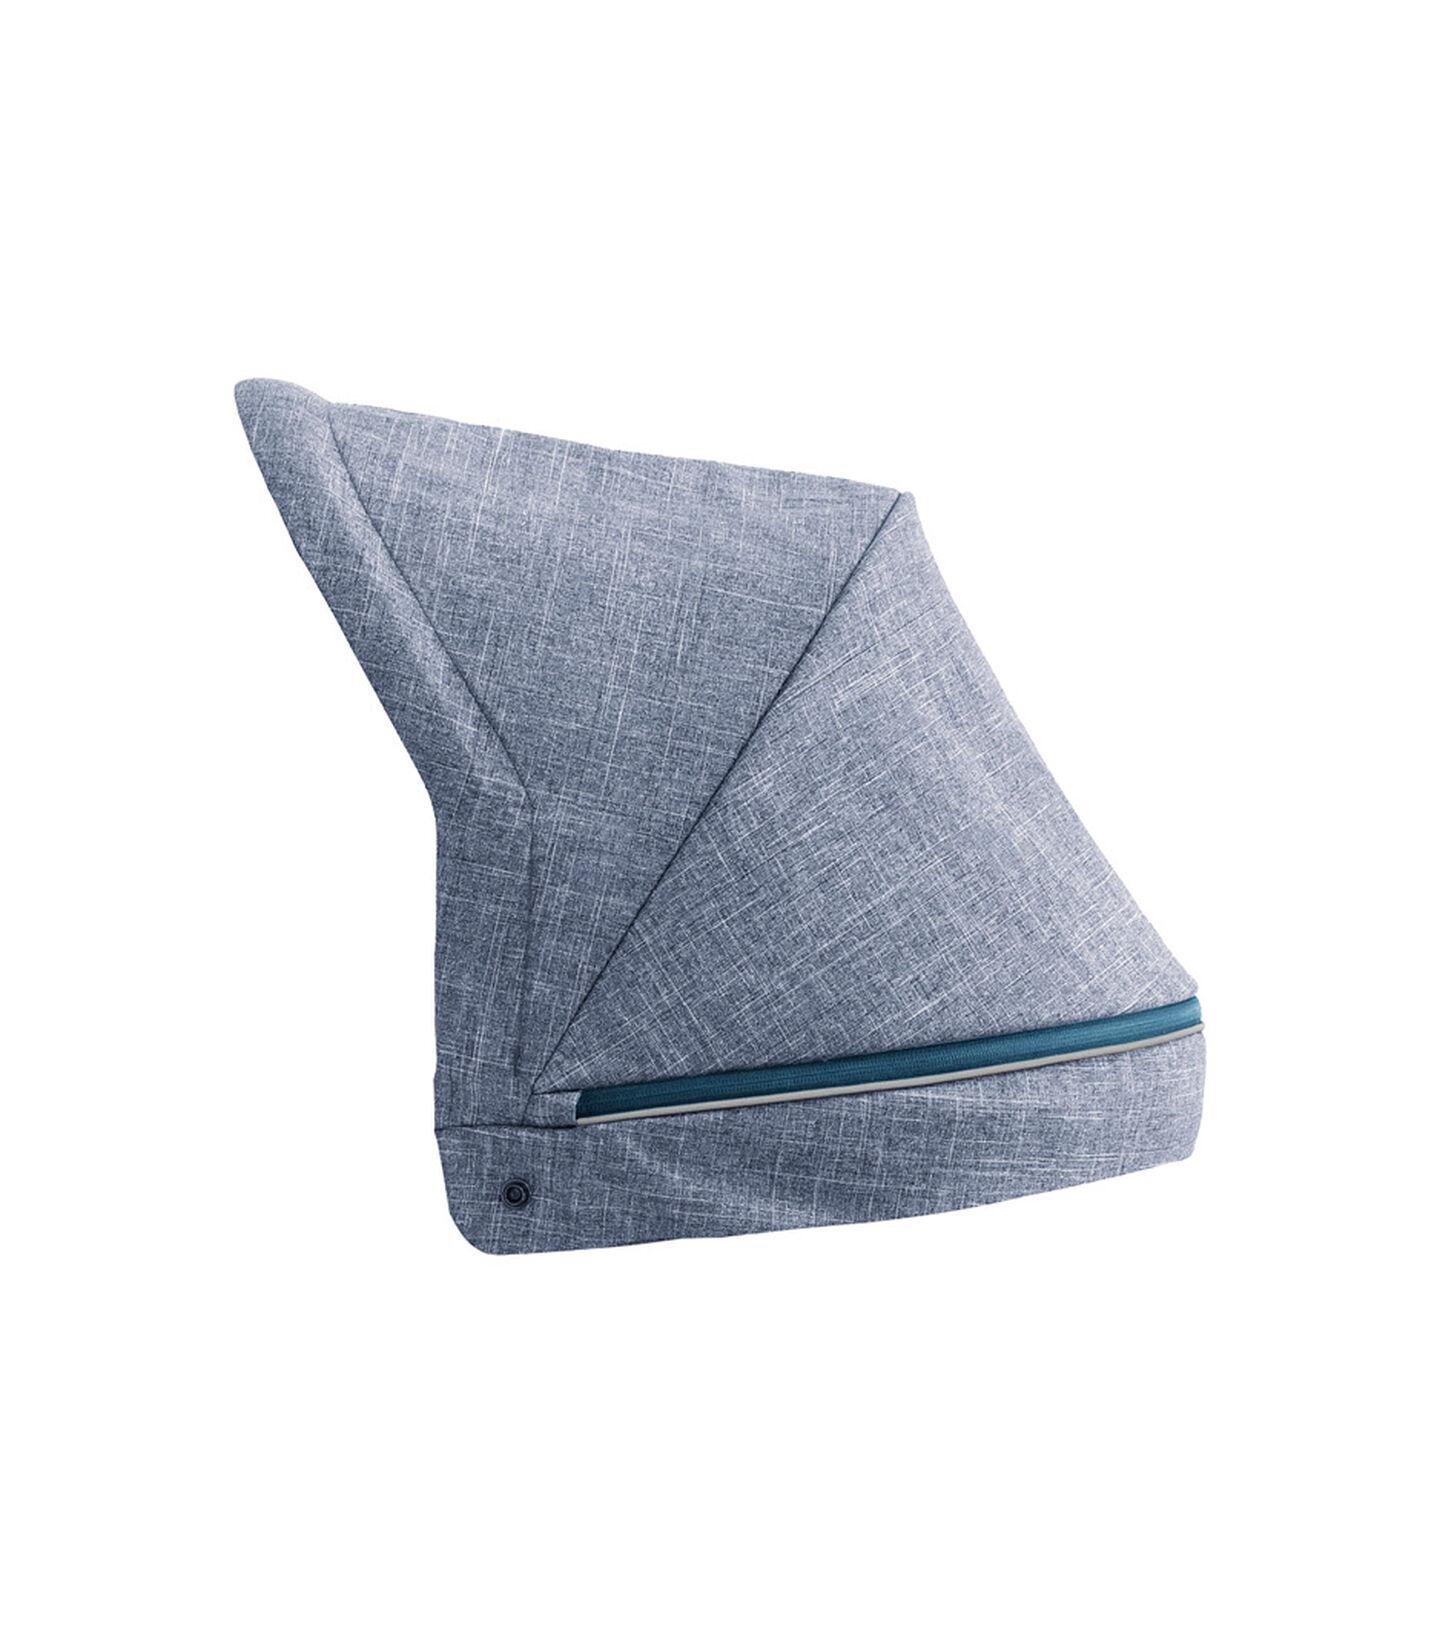 Stokke® Beat Canopy Blue Melange, Blu Melange, mainview view 2